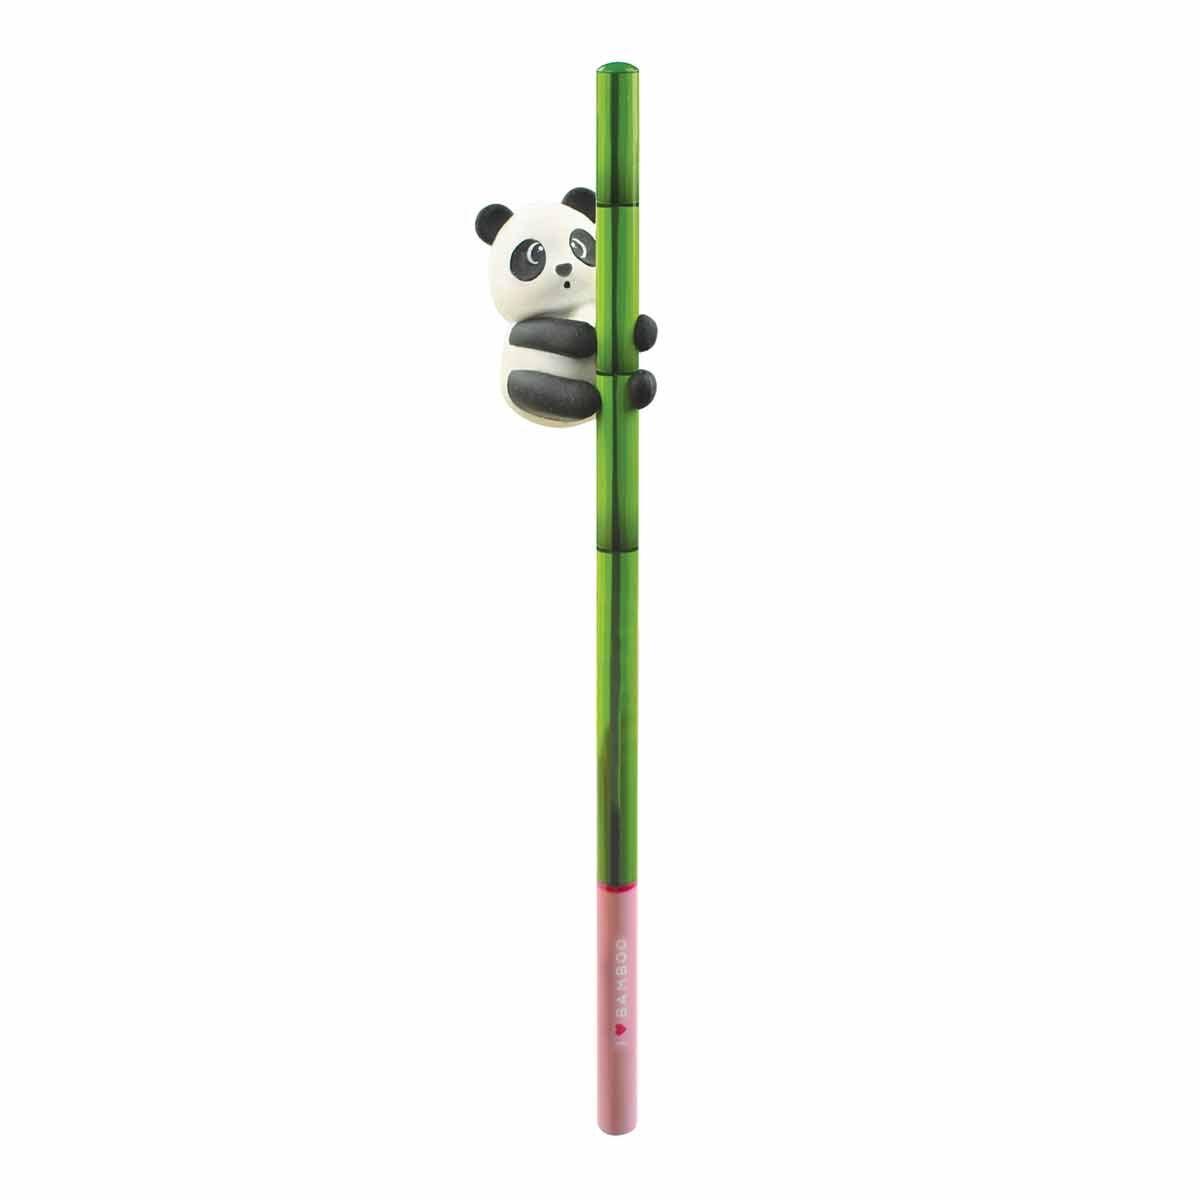 Legami I Love Bamboo Pencil with Eraser